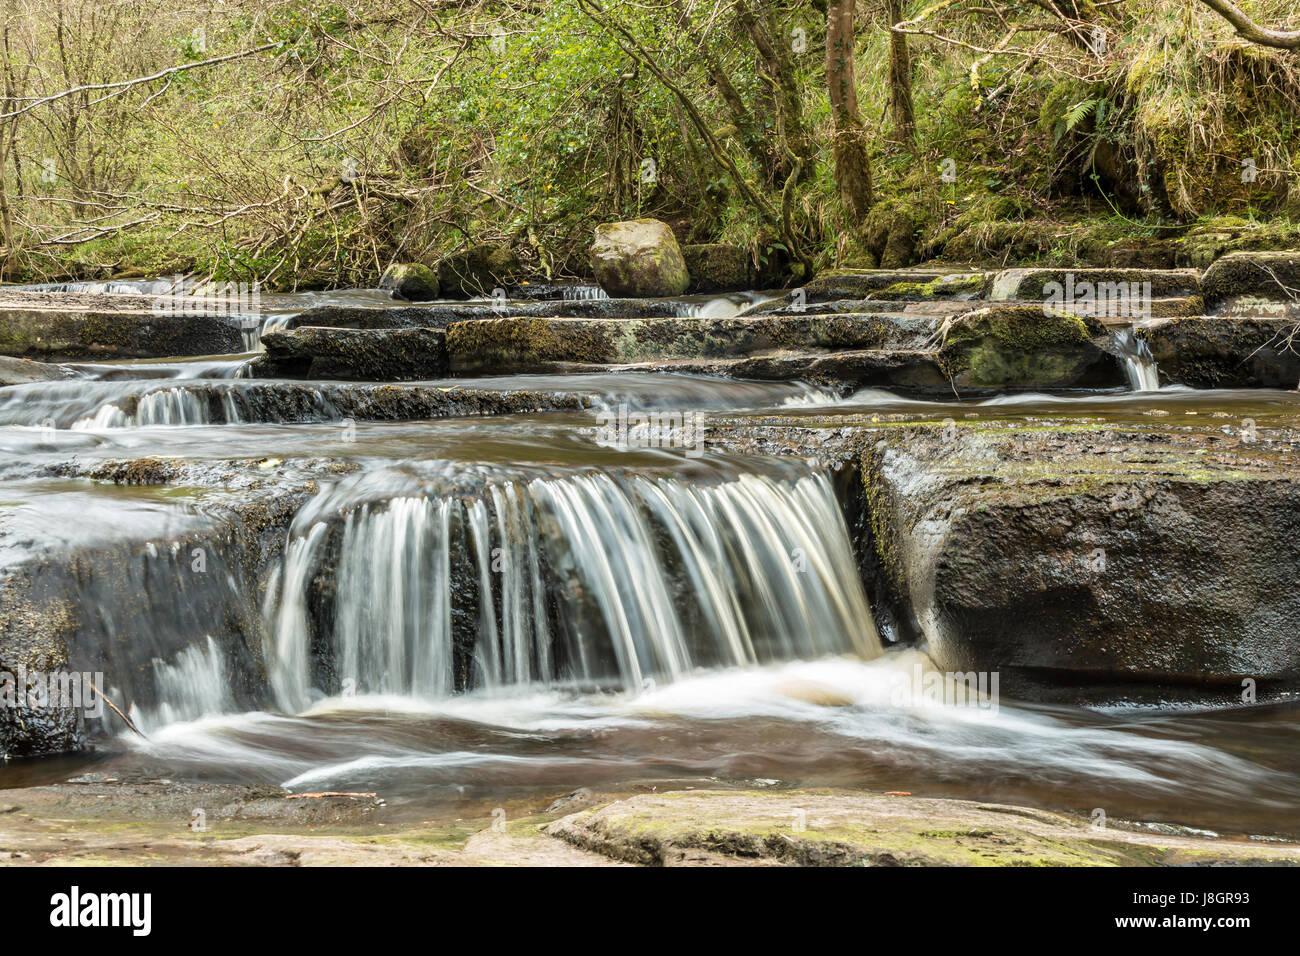 Sleive Bloom Mountains Ireland - Stock Image